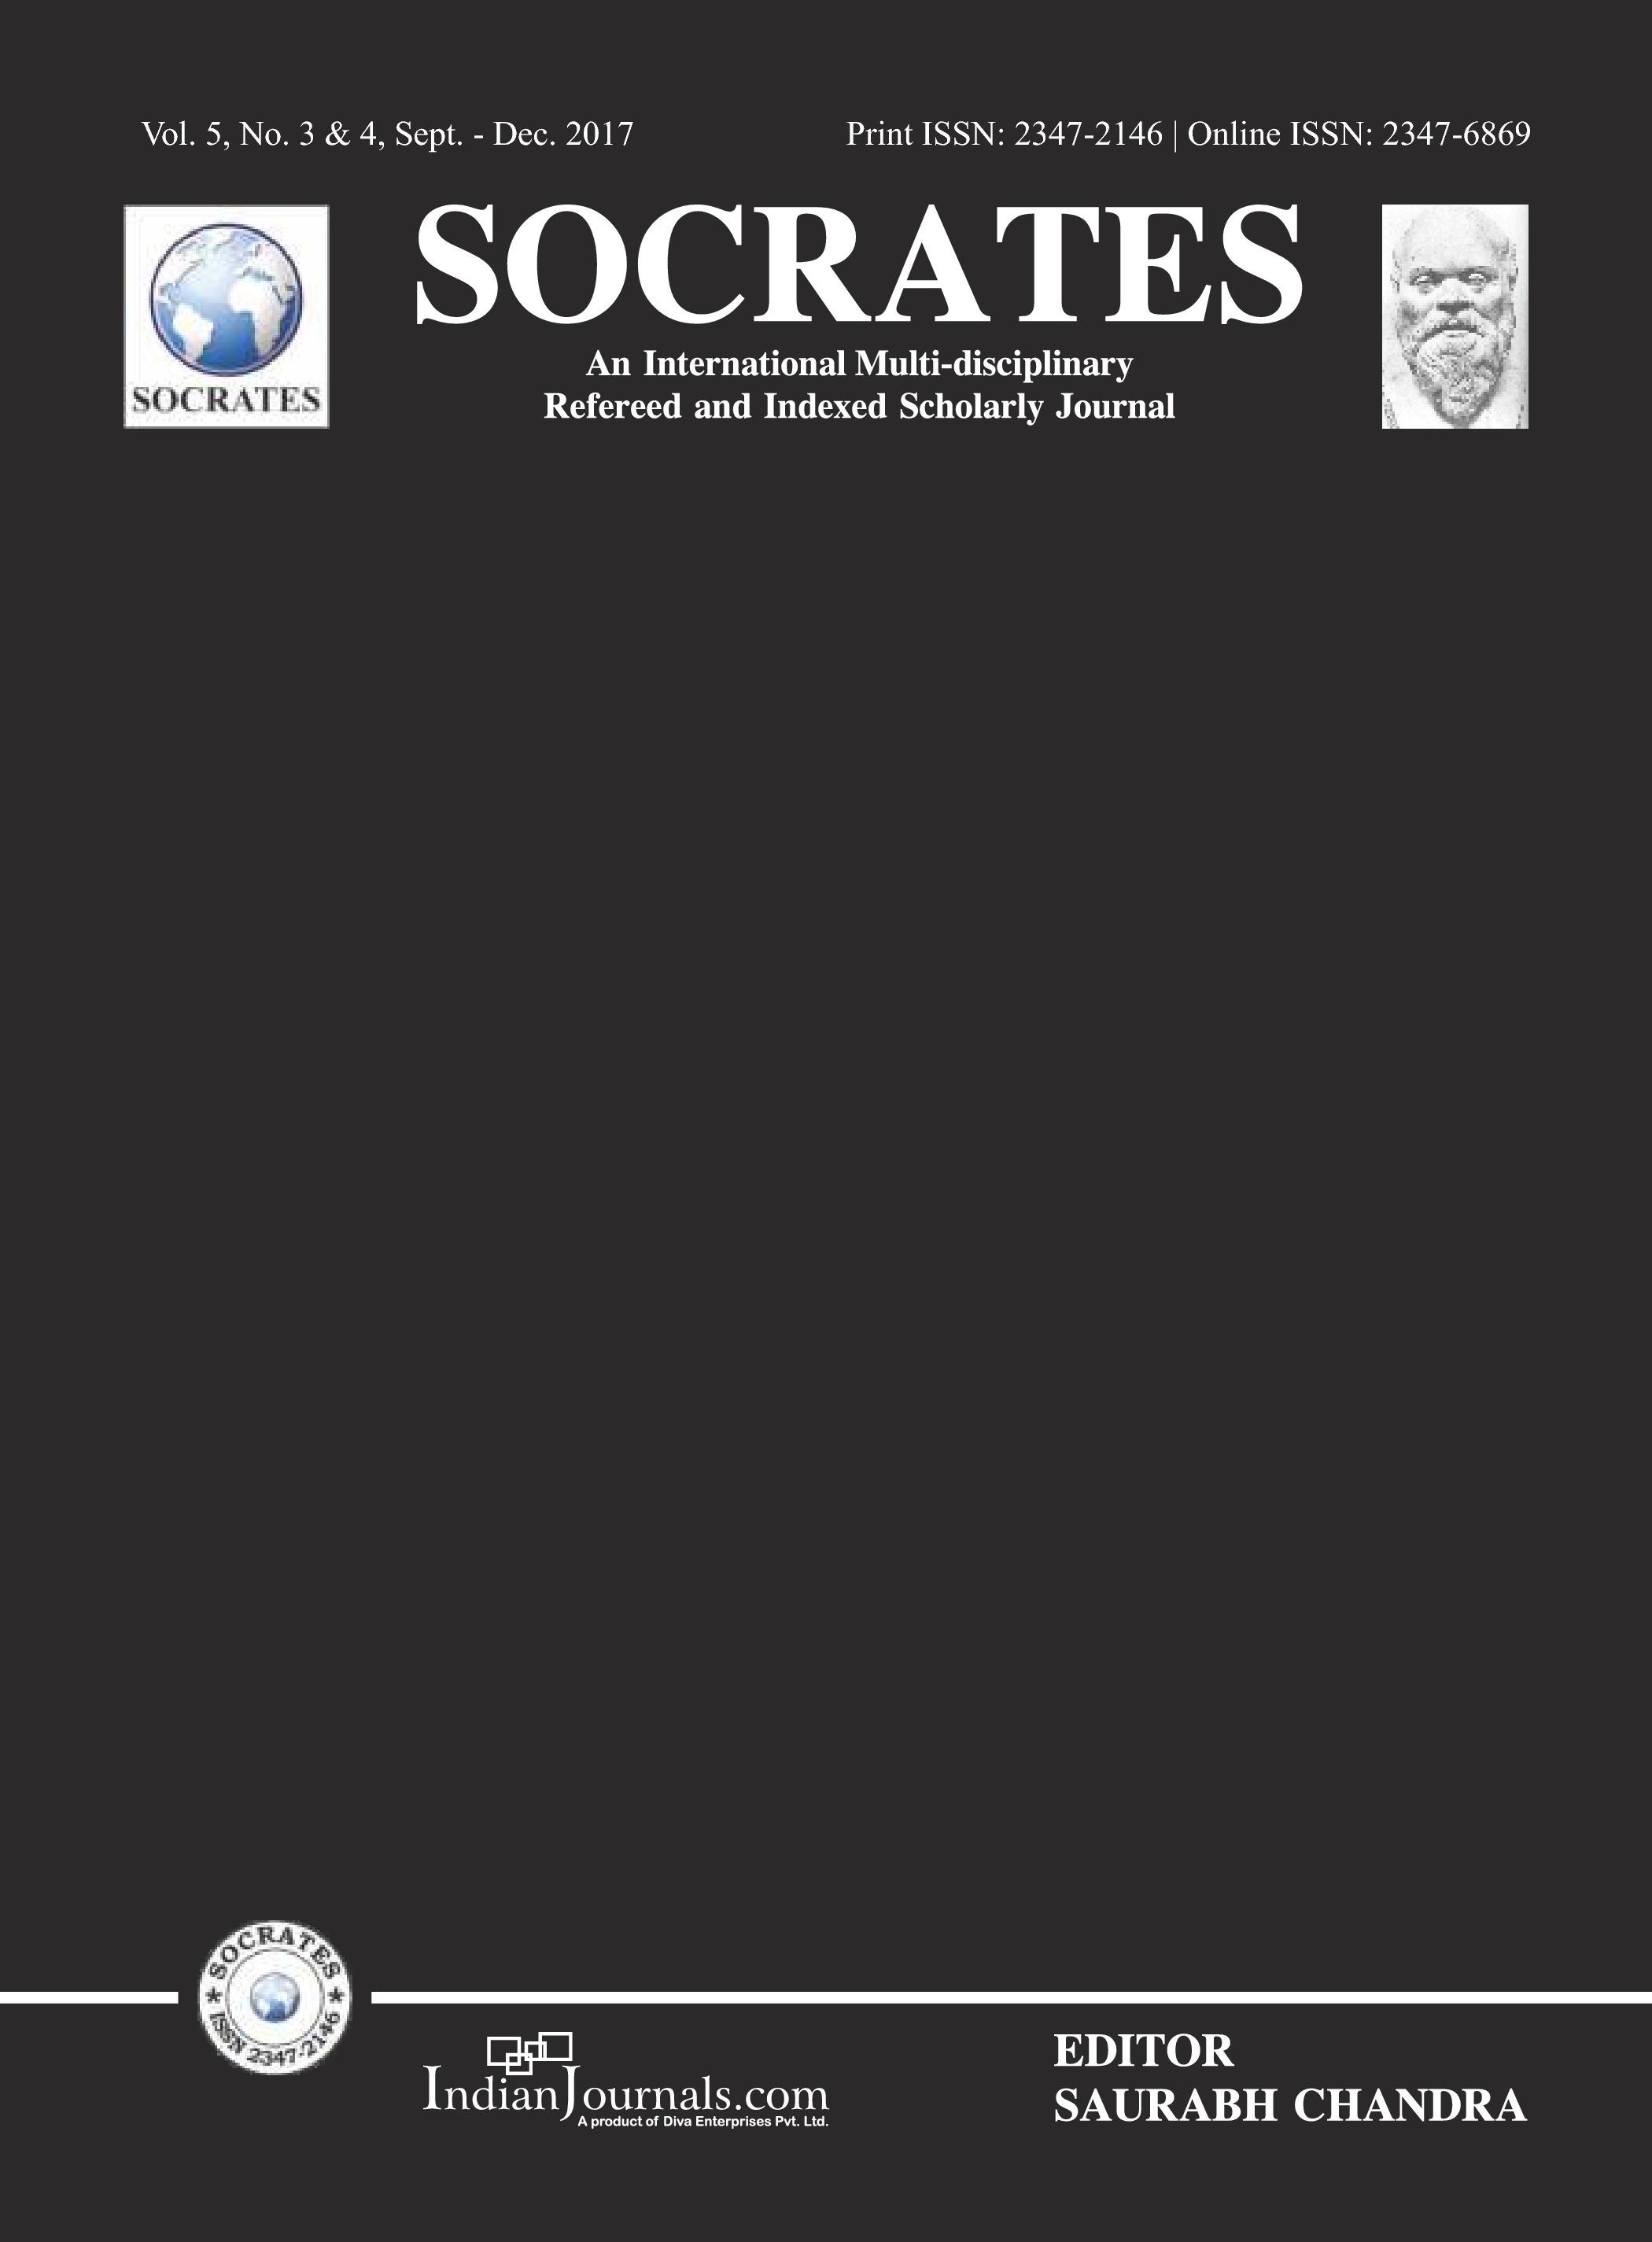 SOCRATES Vol 3, No 3 (2015): Issue- September